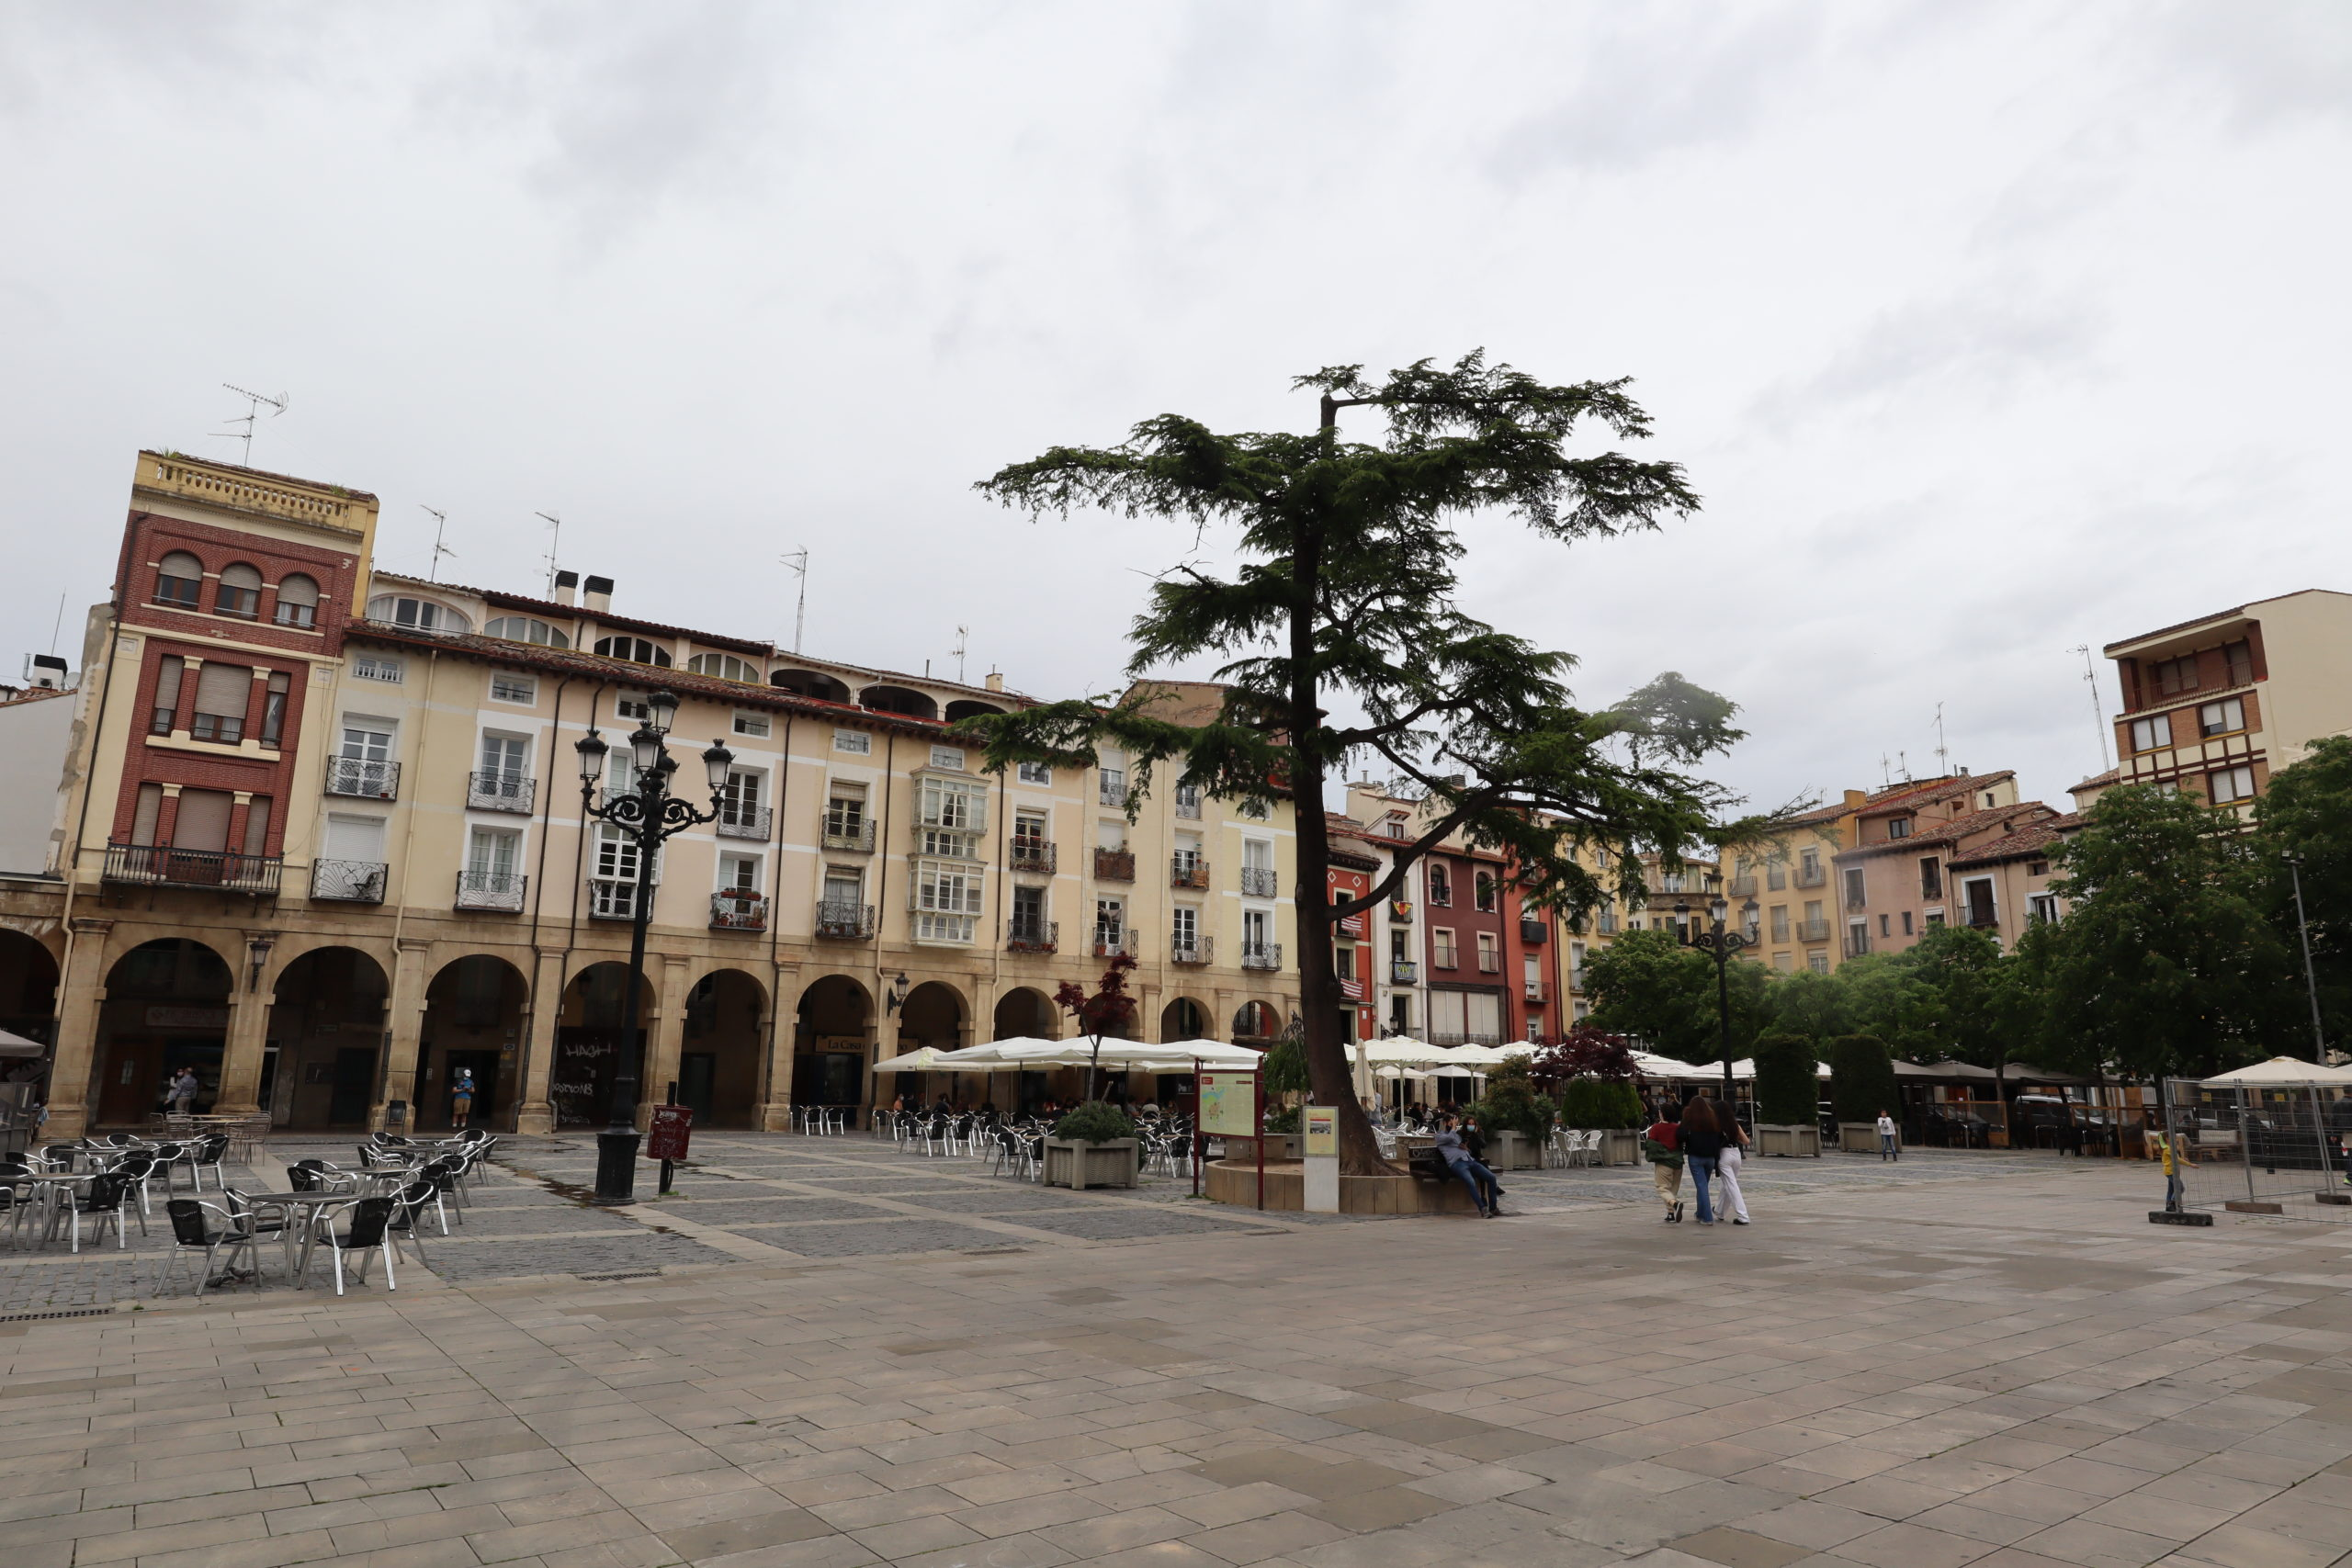 plaza-del-mercado-logroño